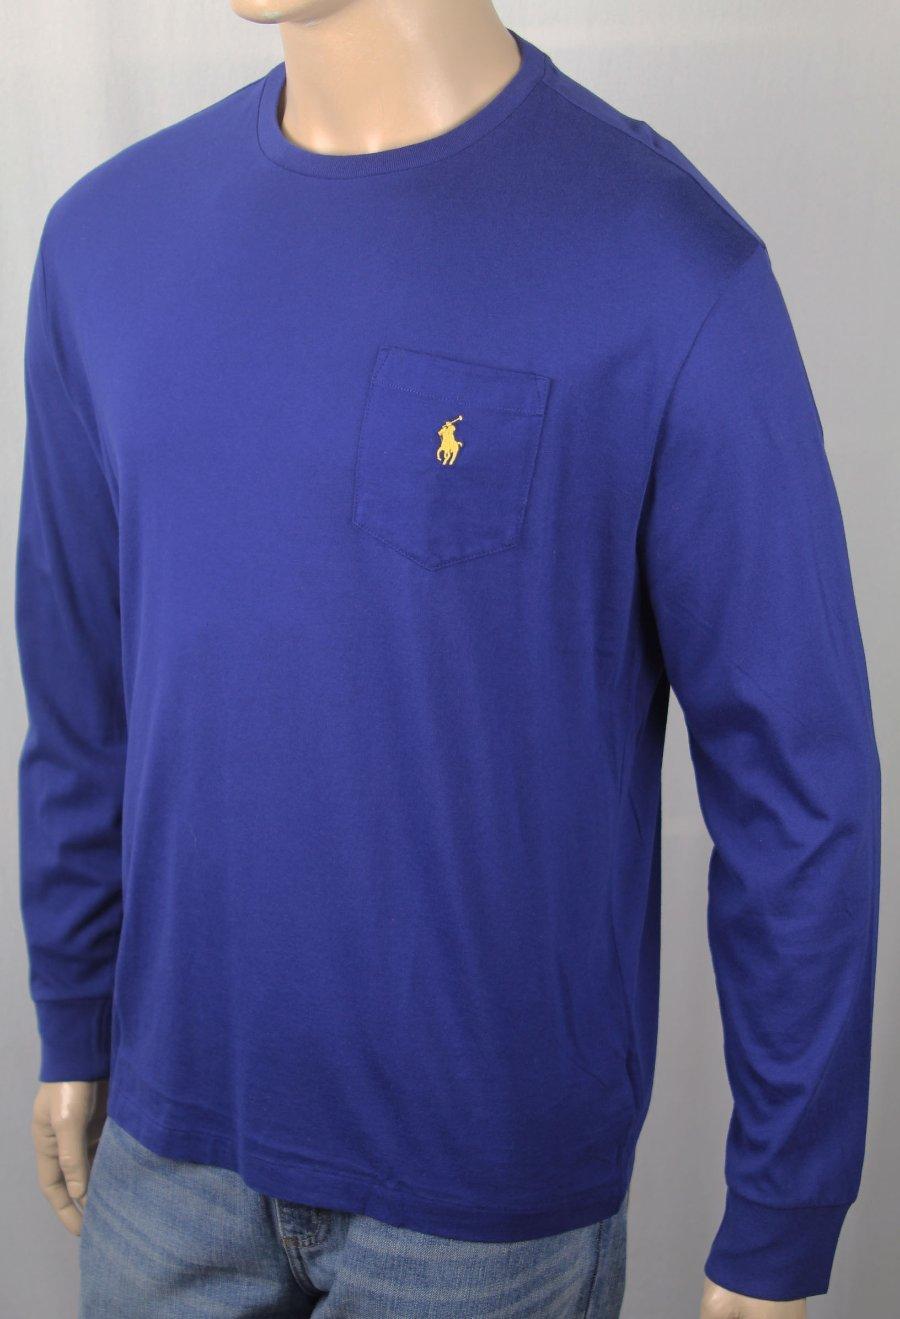 14d8bd2f1d85 Details about Polo Ralph Lauren Blue Crew Neck Classic Long Sleeve Tee T- Shirt Pocket NWT